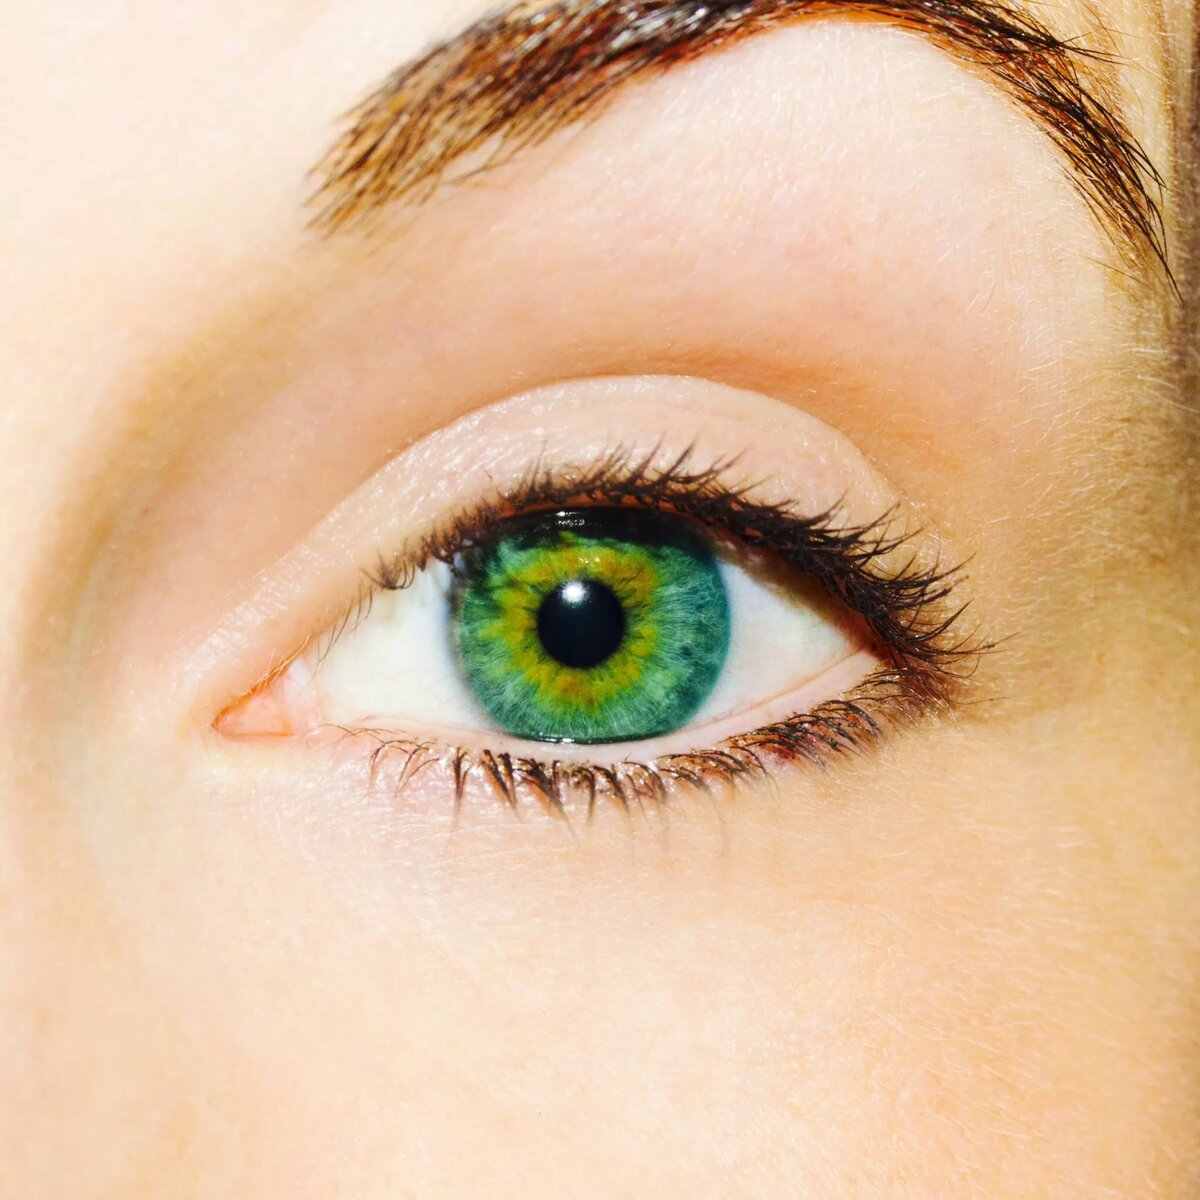 Картинки глаз серо-зеленого цвета